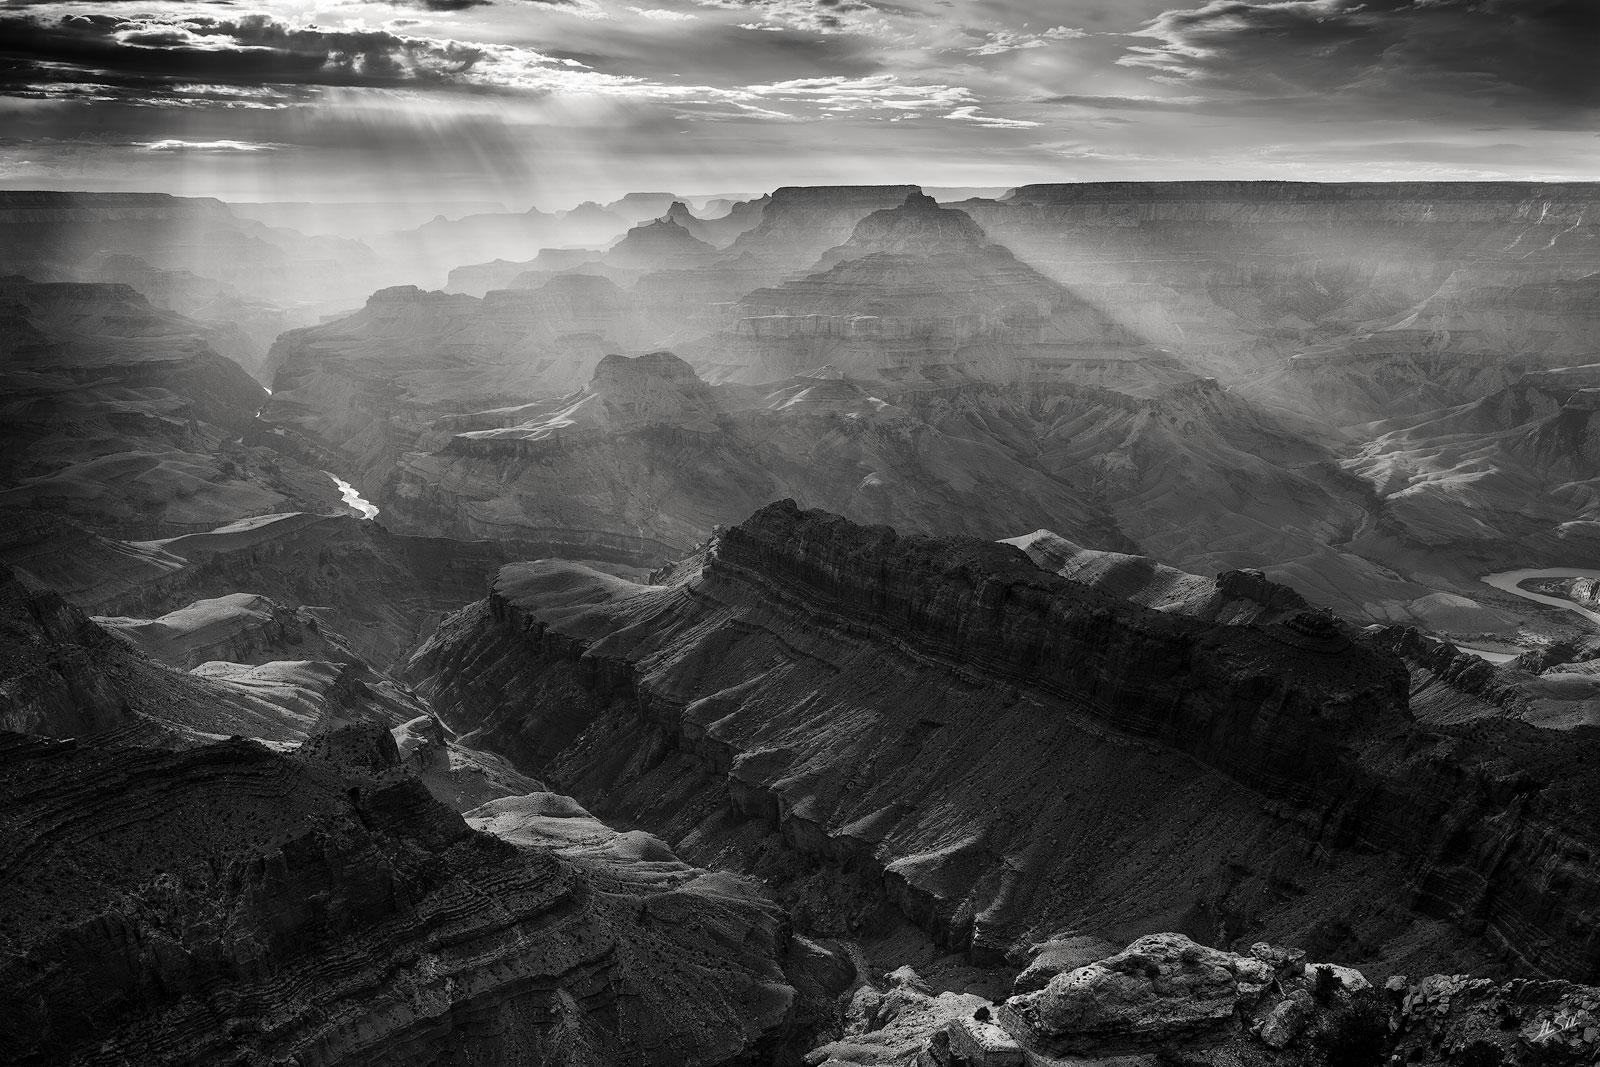 AZ, Arizona, Black & White, Colorado River, Crepuscular Rays, God Beams, Grand Canyon, Lipan Point, National Park, South Rim, Summer, Sun beams, photo